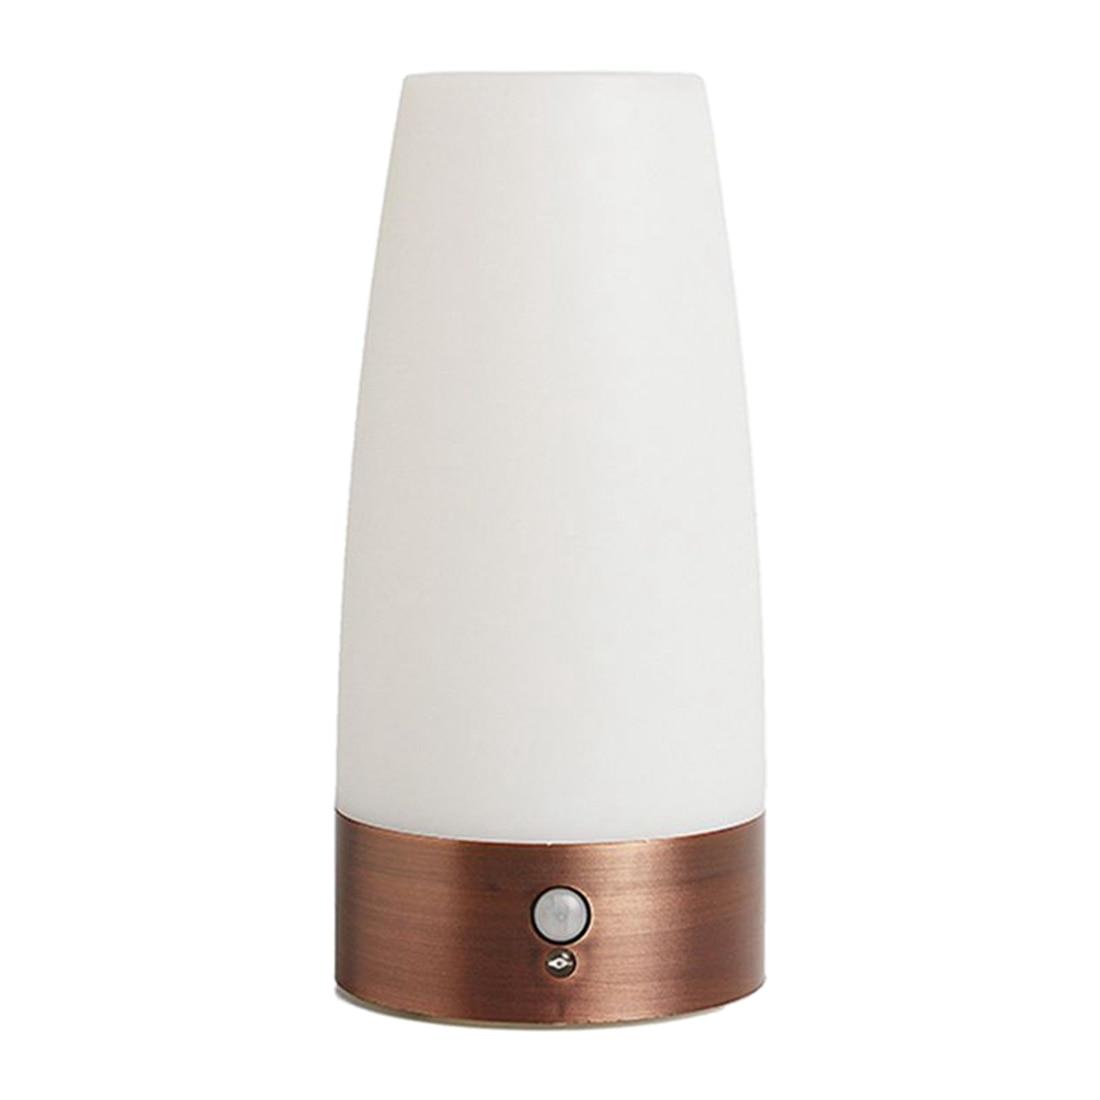 LED Smart Sensor Night Light Creative Home Lighting Control Small Desk Lamp Continental Reading Lamp LED Atmosphere Night Lights